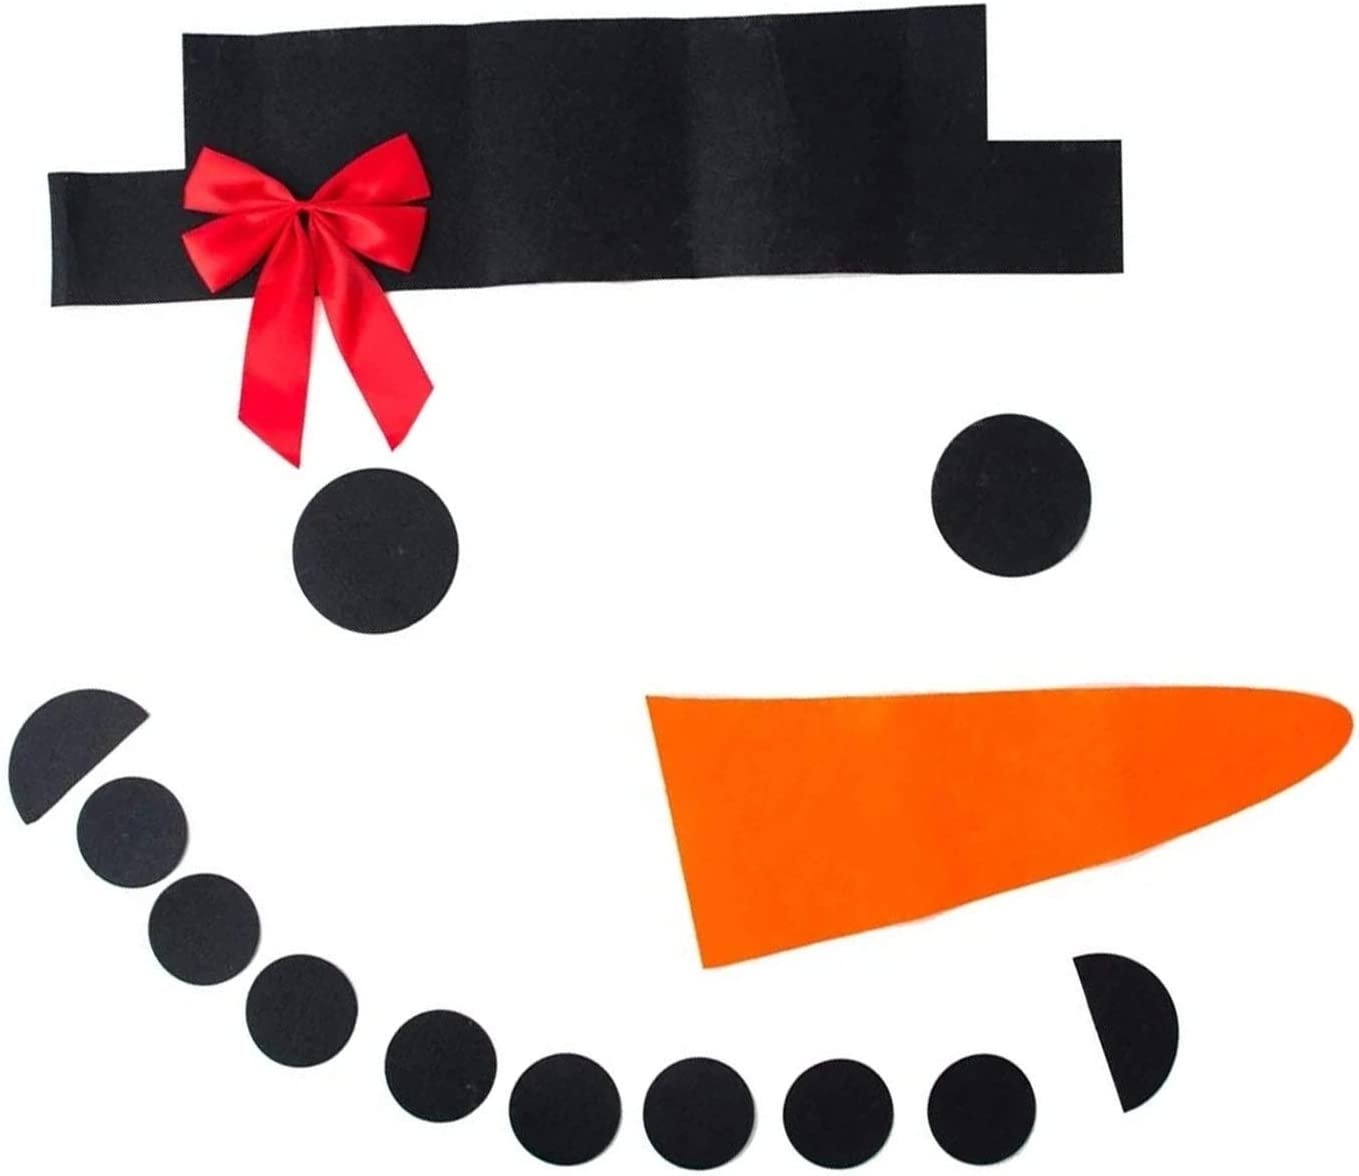 Amoin 16Pcs DIY Christmas Snowman Stickers Set Outdoor Garage Door Decoration Merry Christmas Holiday DIY Snowman Decoration